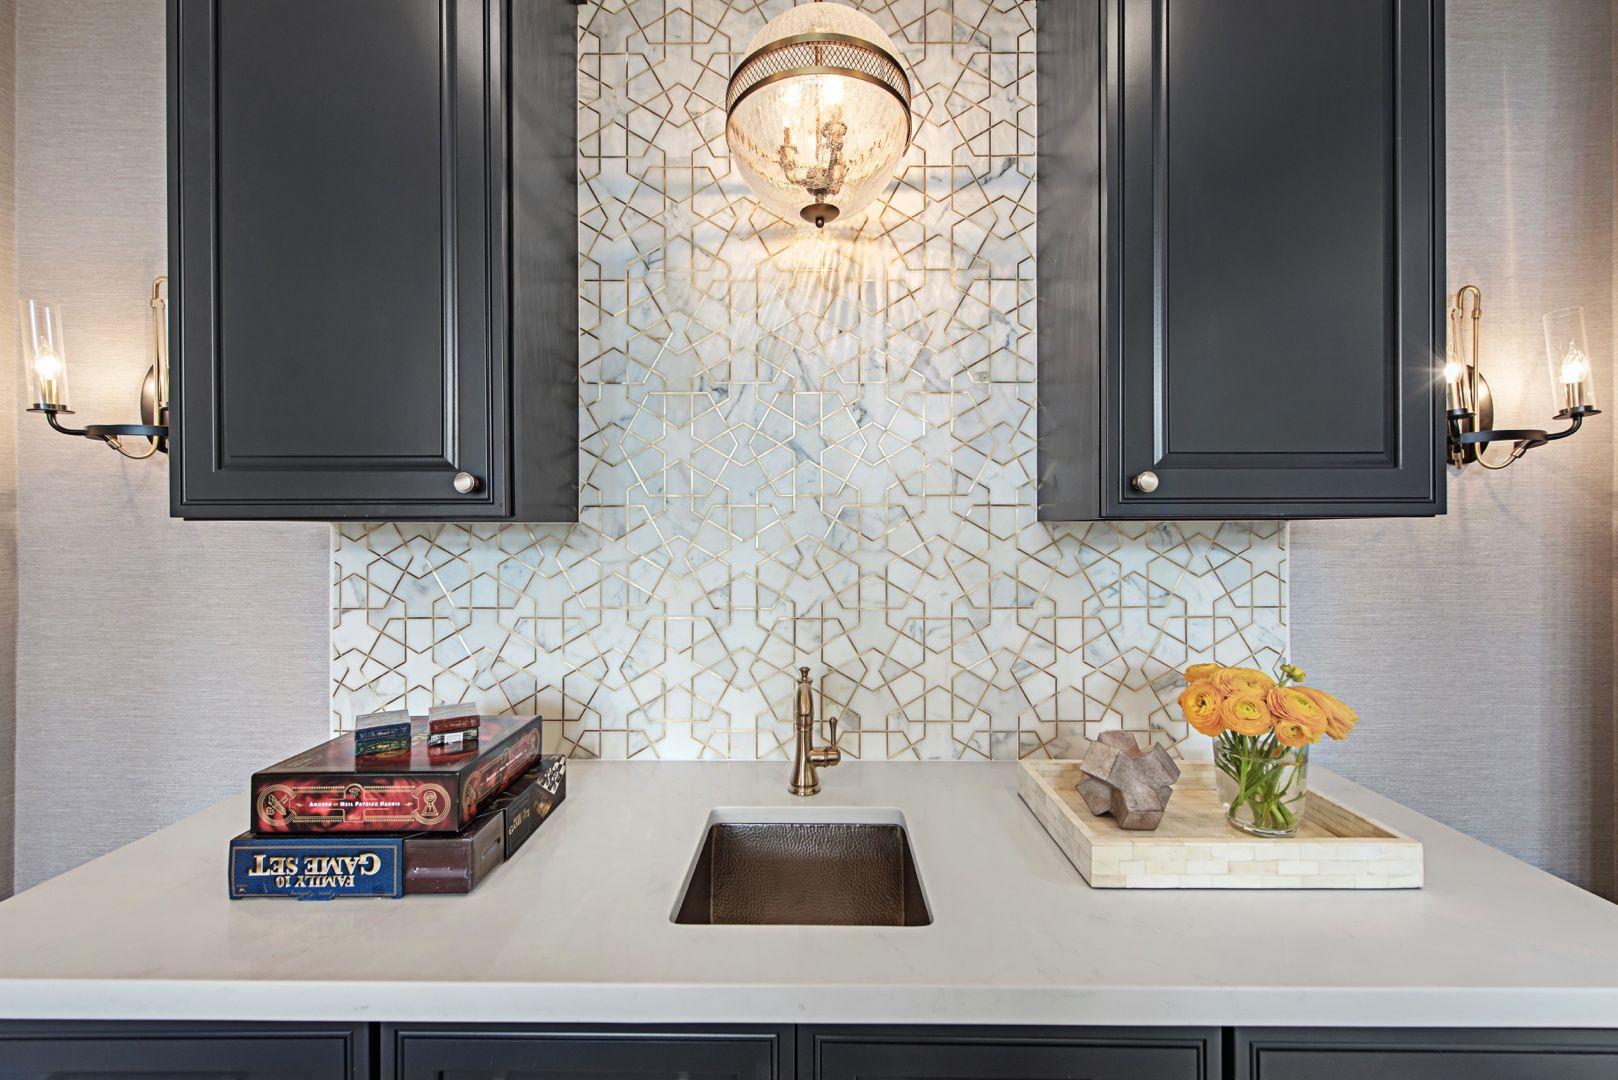 - Property Brothers Help Renovate Las Vegas Home Las Vegas Homes, Home  Remodeling, Home Renovation